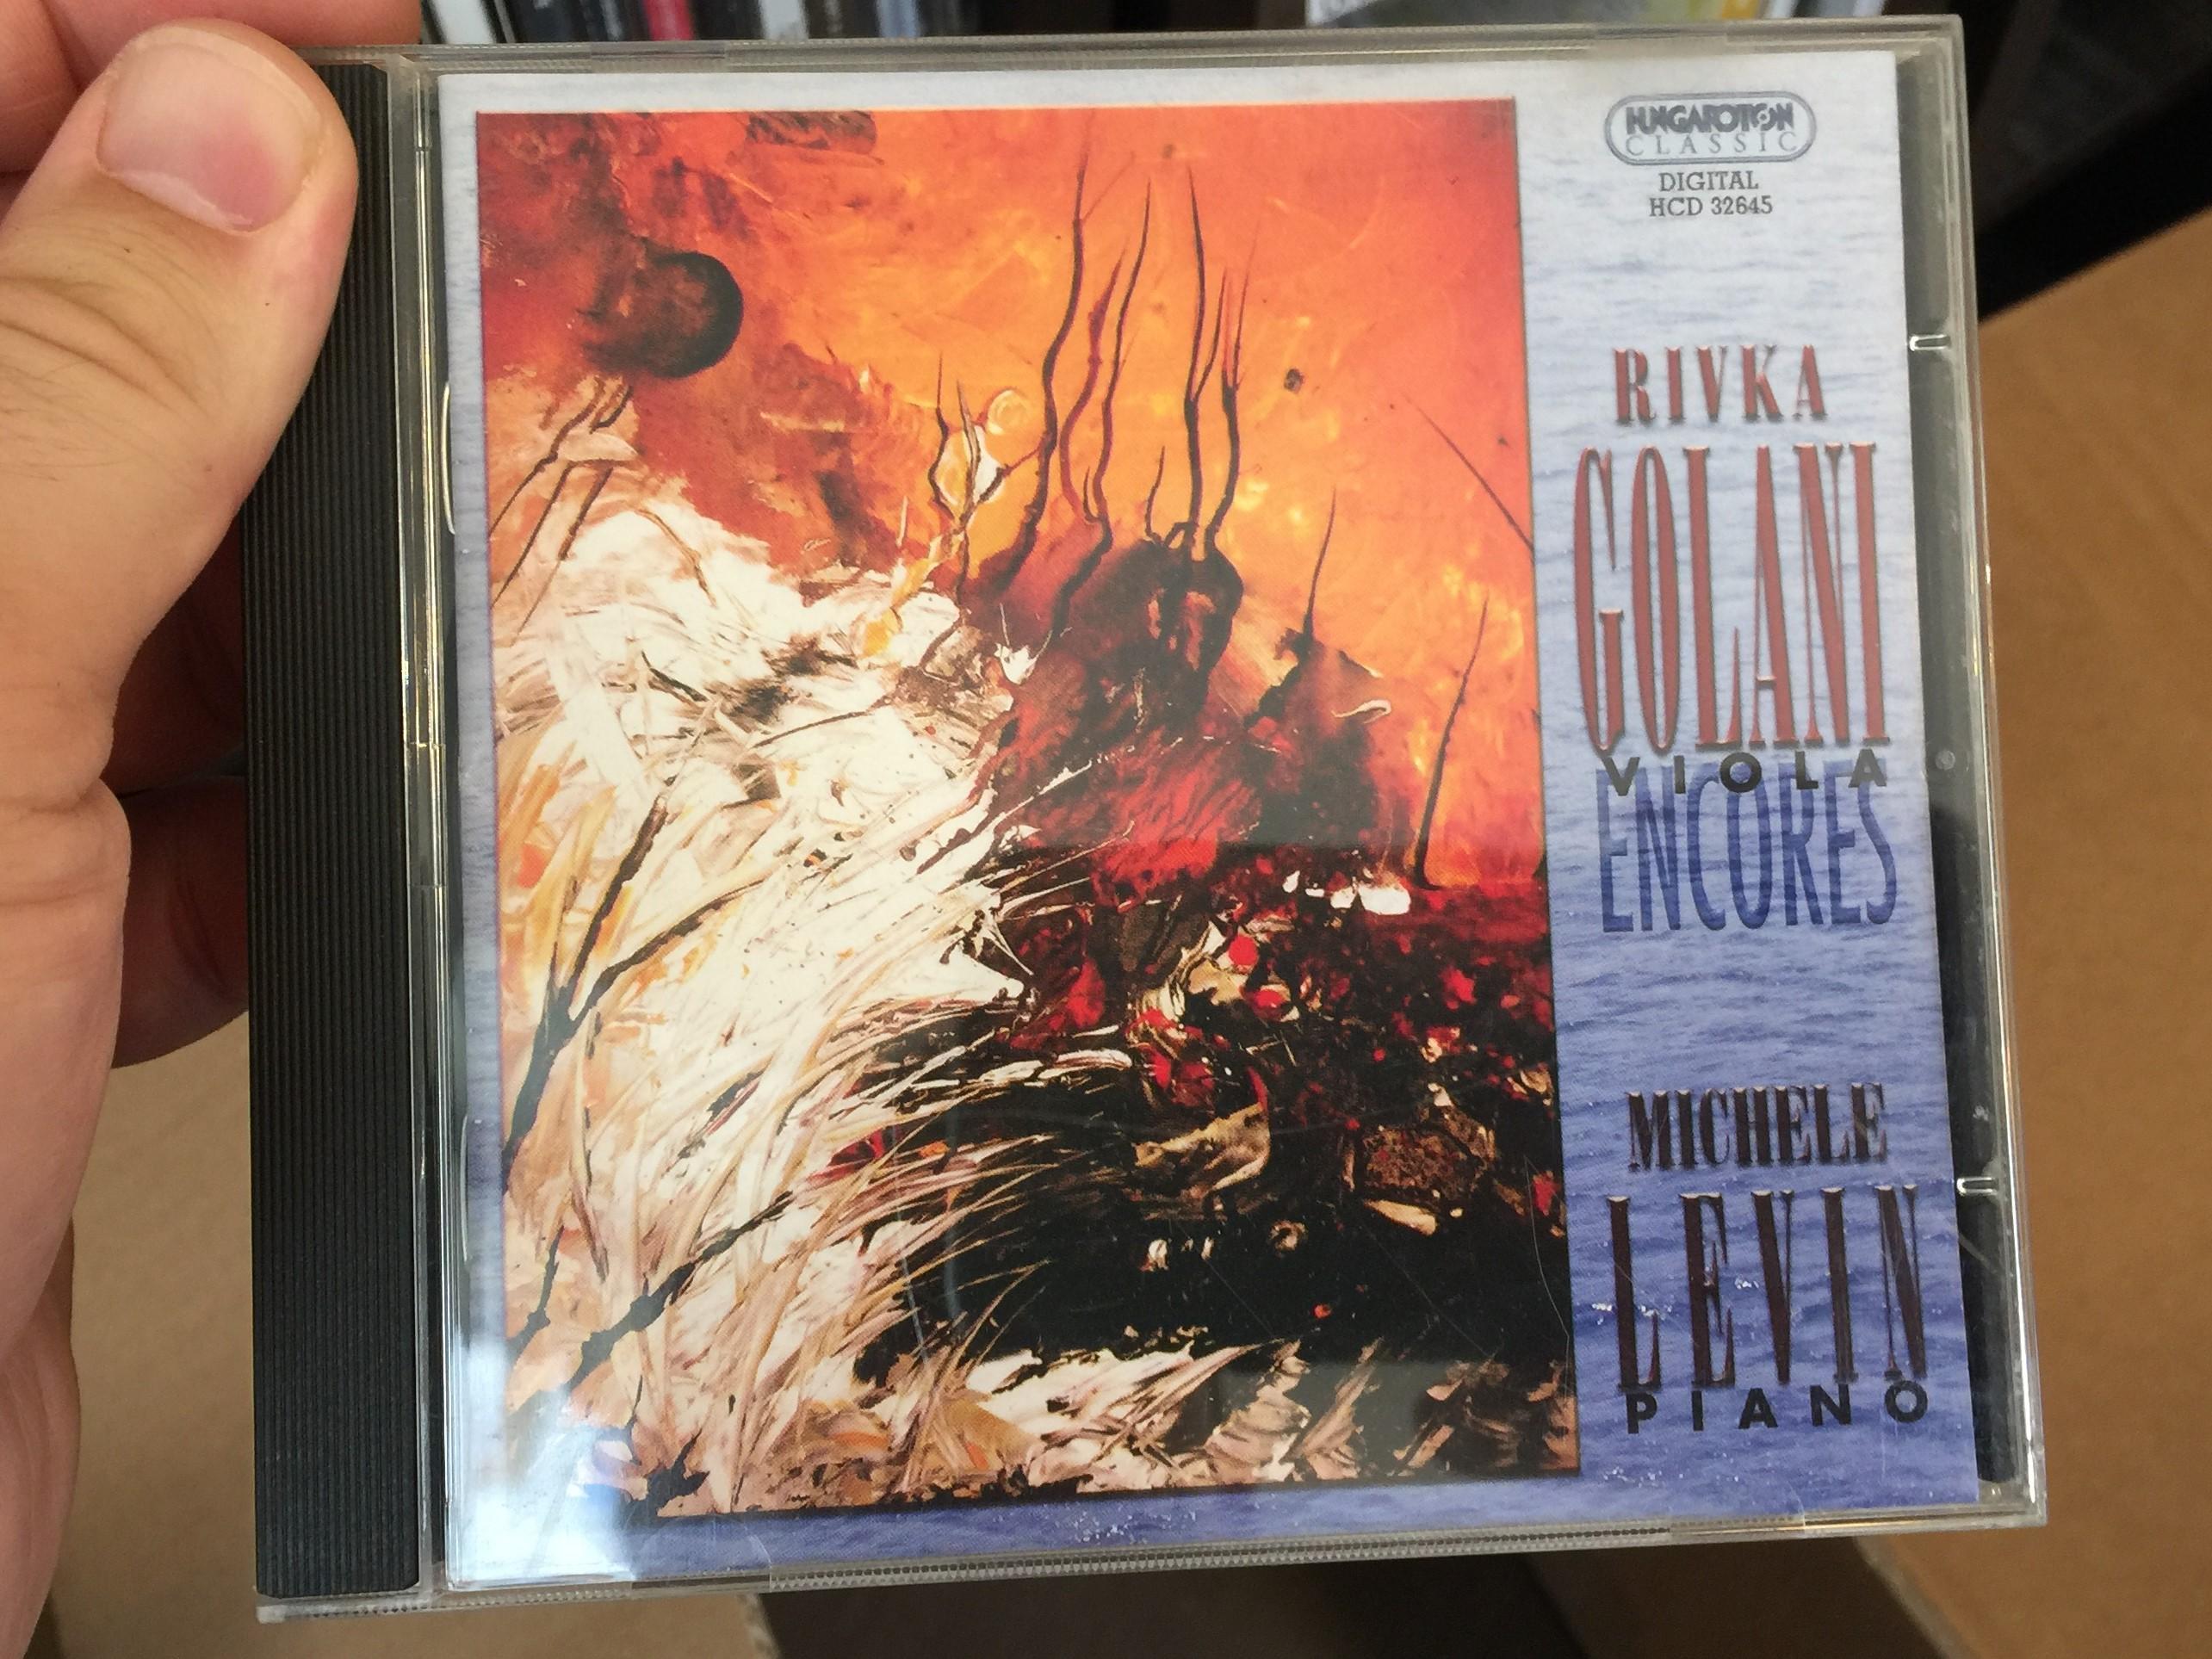 rivka-golani-viola-encores-michele-levin-piano-hungaroton-classic-audio-cd-2009-stereo-hcd-32645-1-.jpg